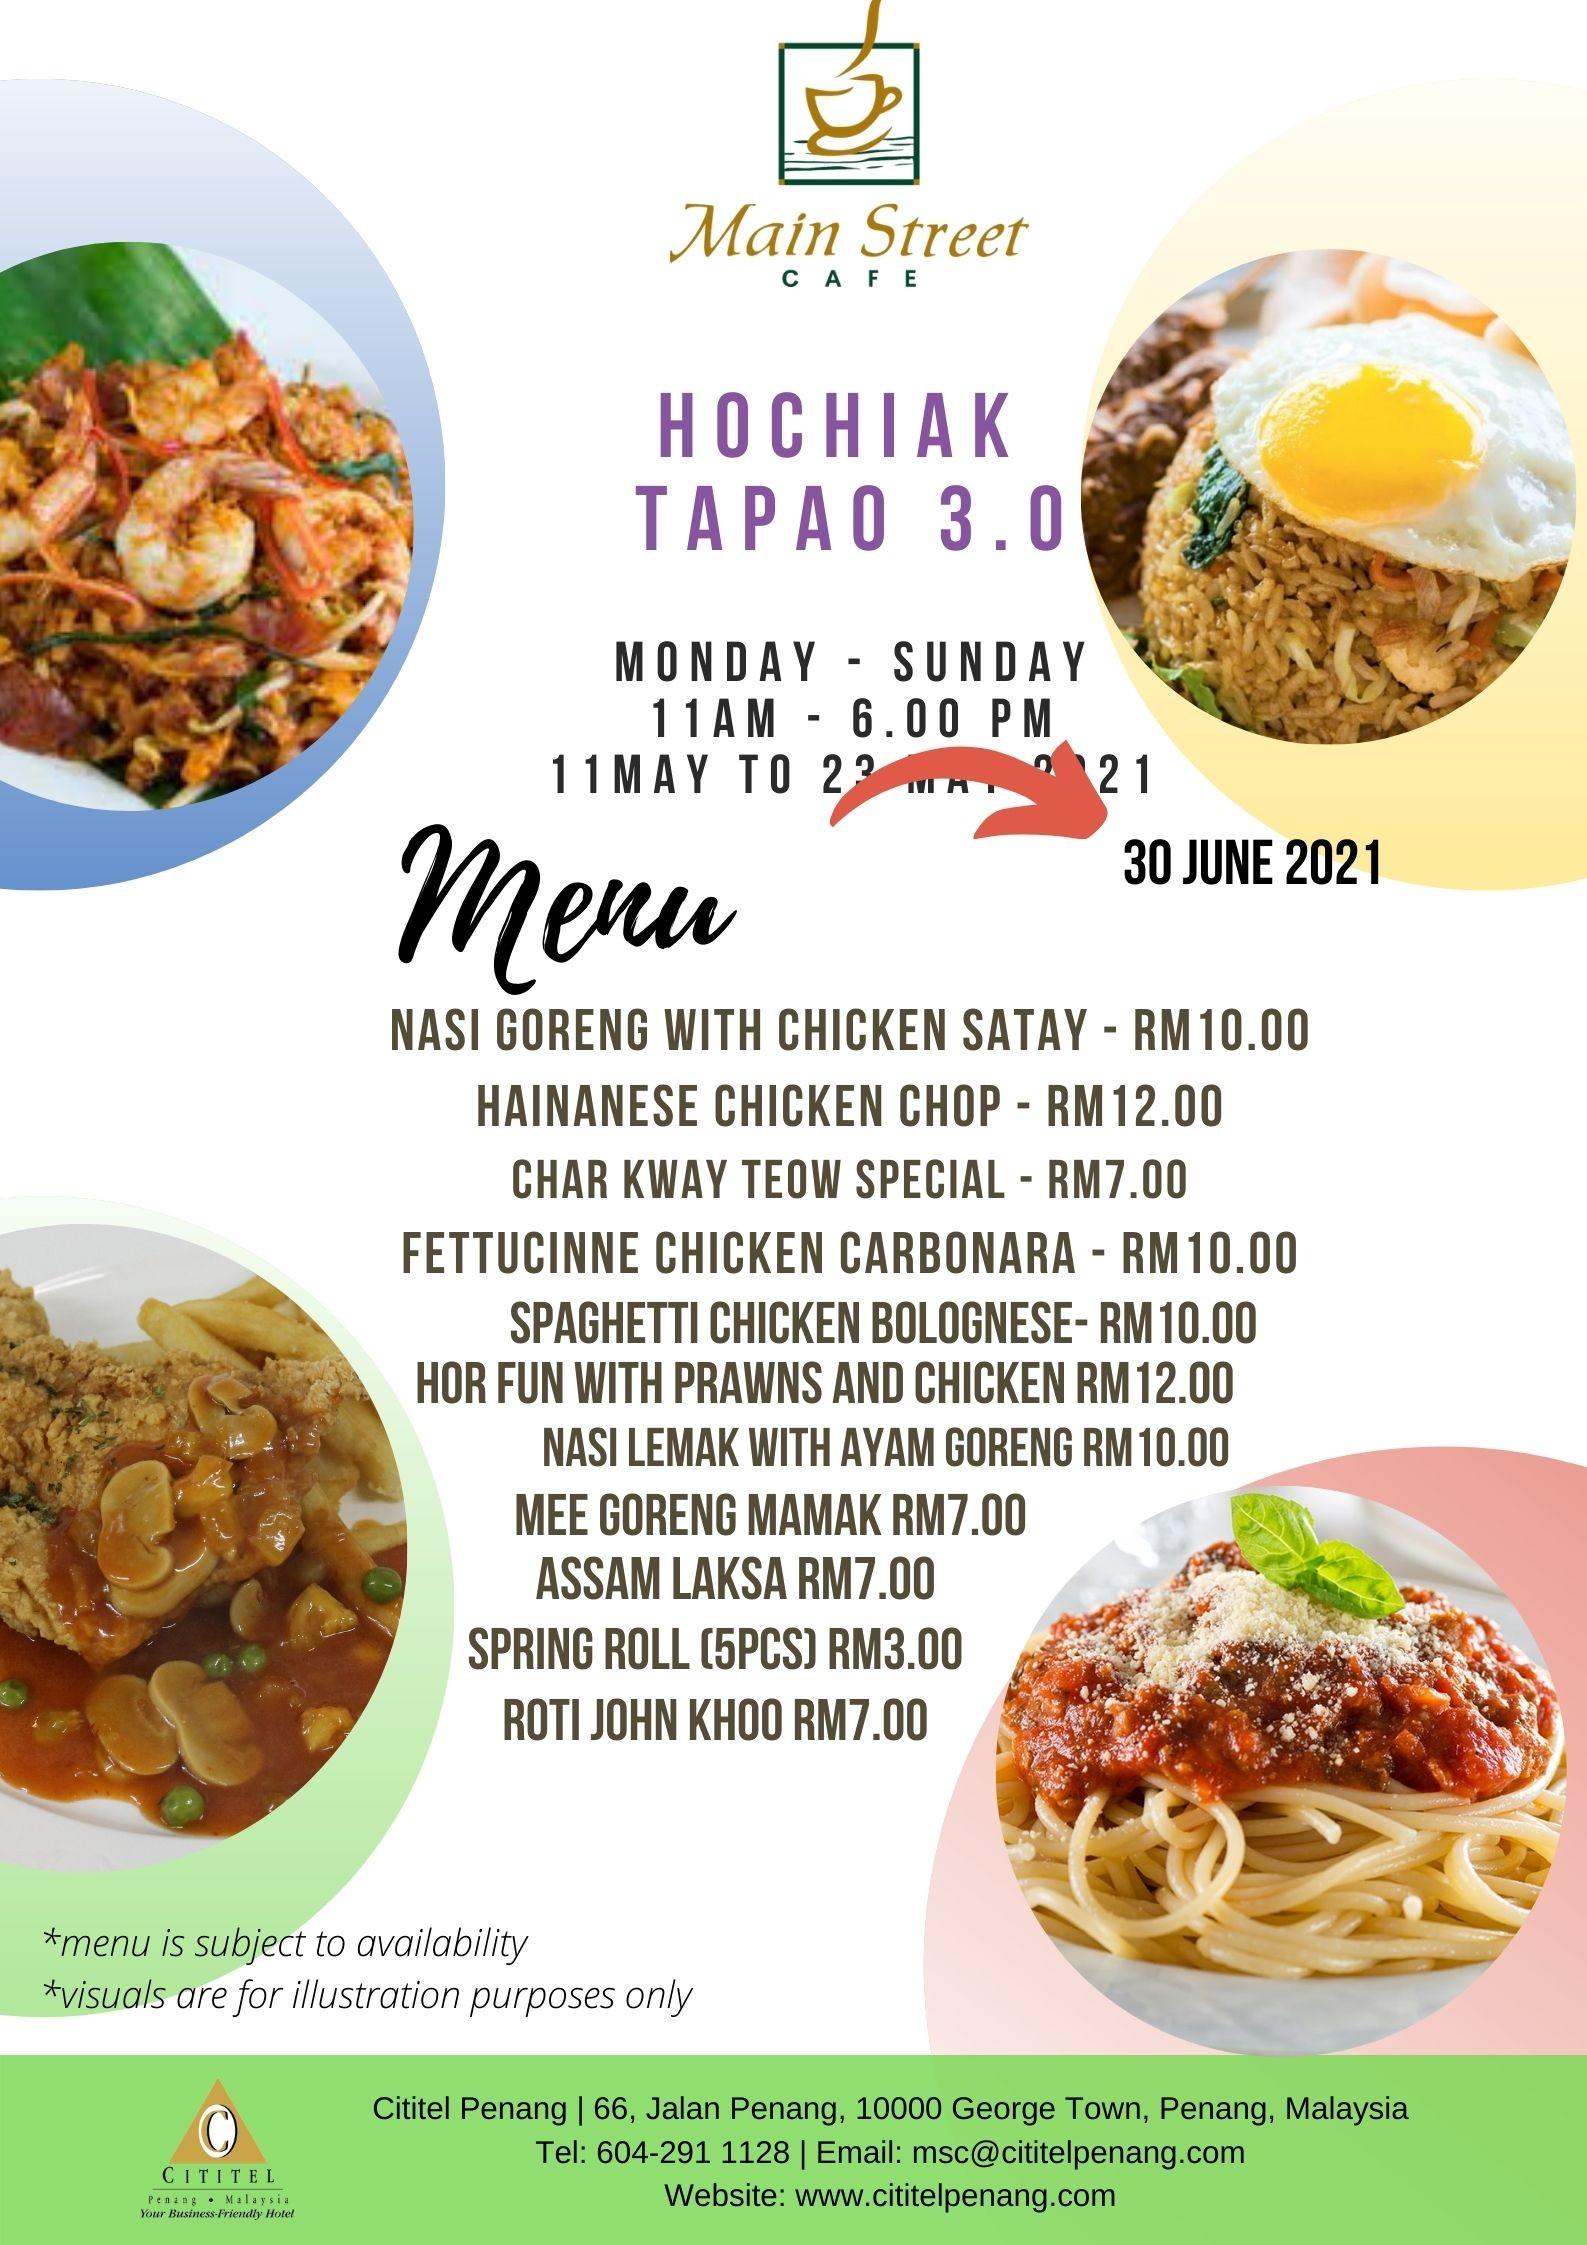 Hochiak Tapao by Cititel Penang